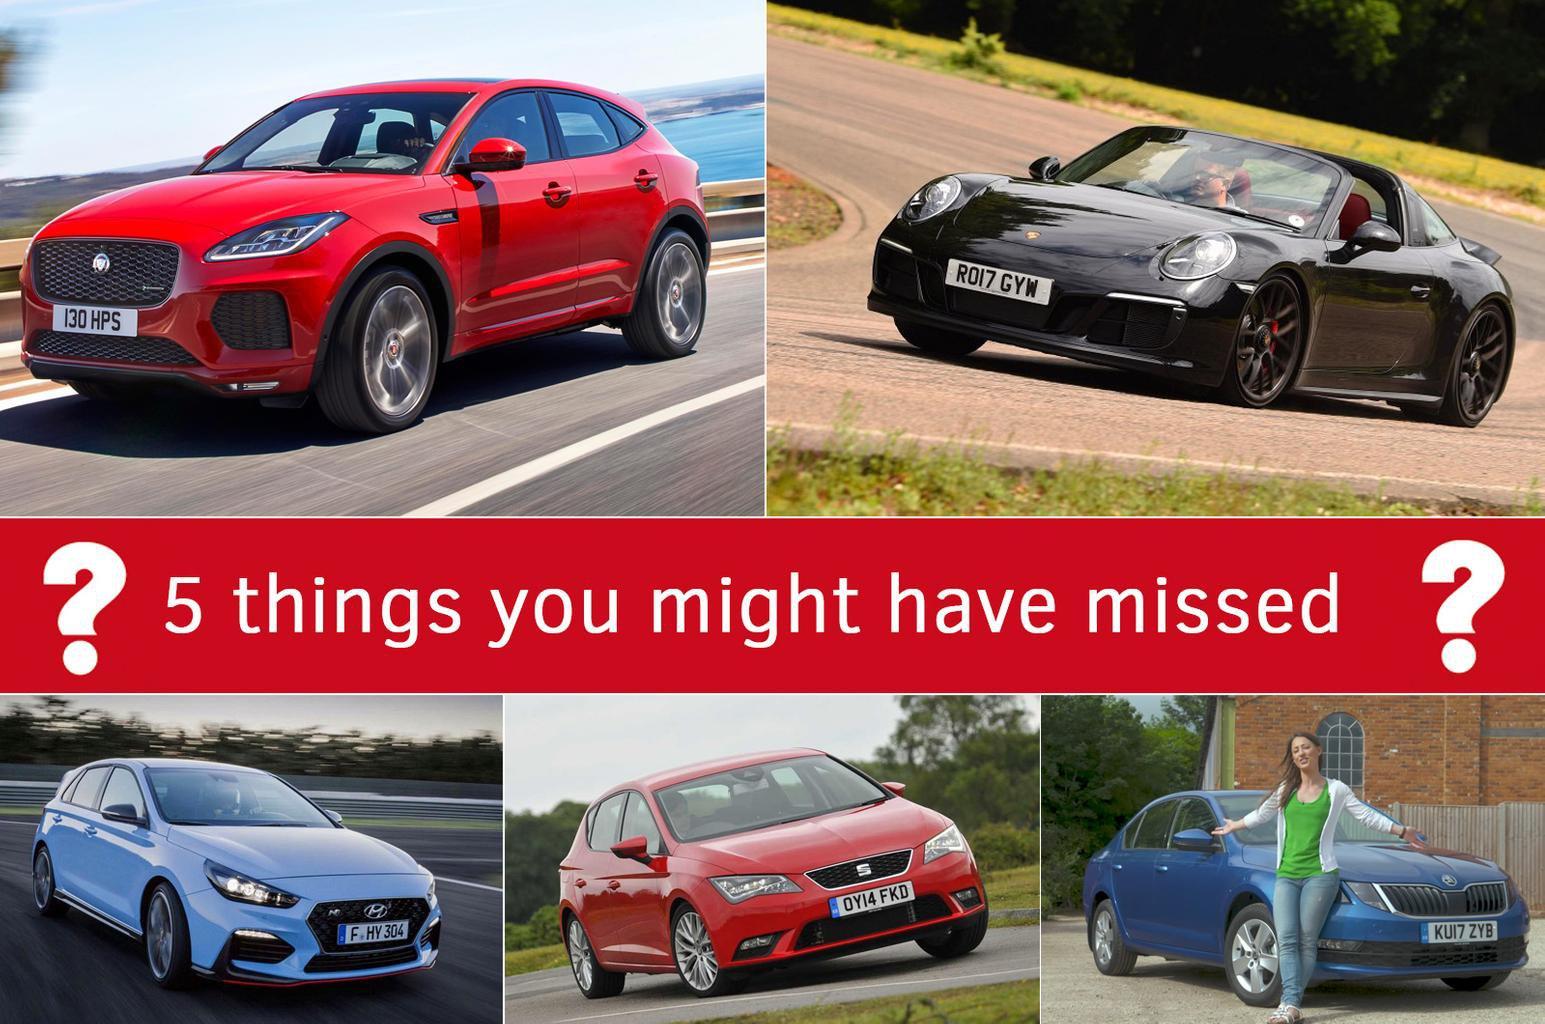 This week on Whatcar.com